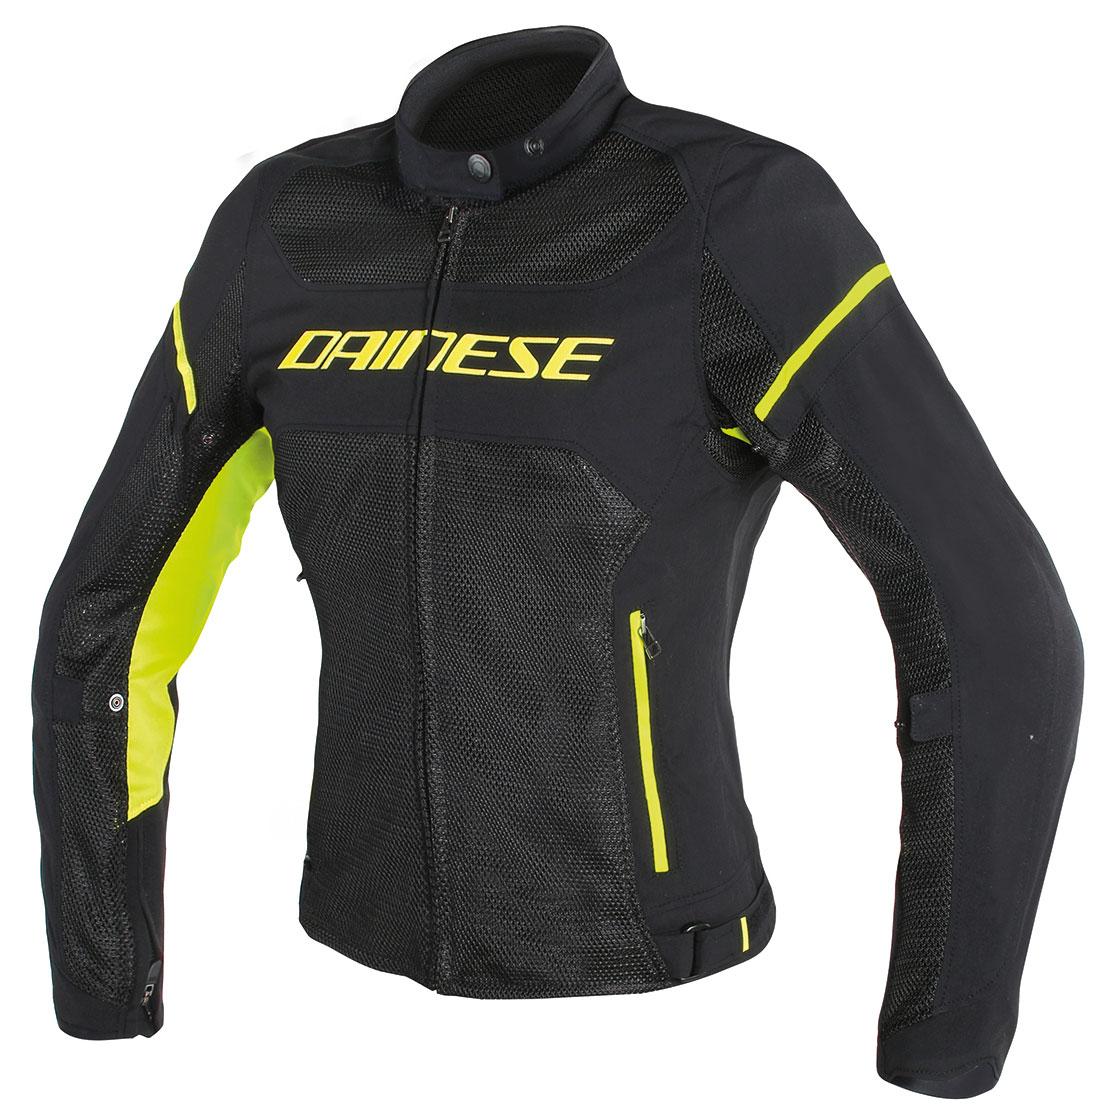 Dainese Women's Air Frame D1 Black/Fluo Yellow Jacket